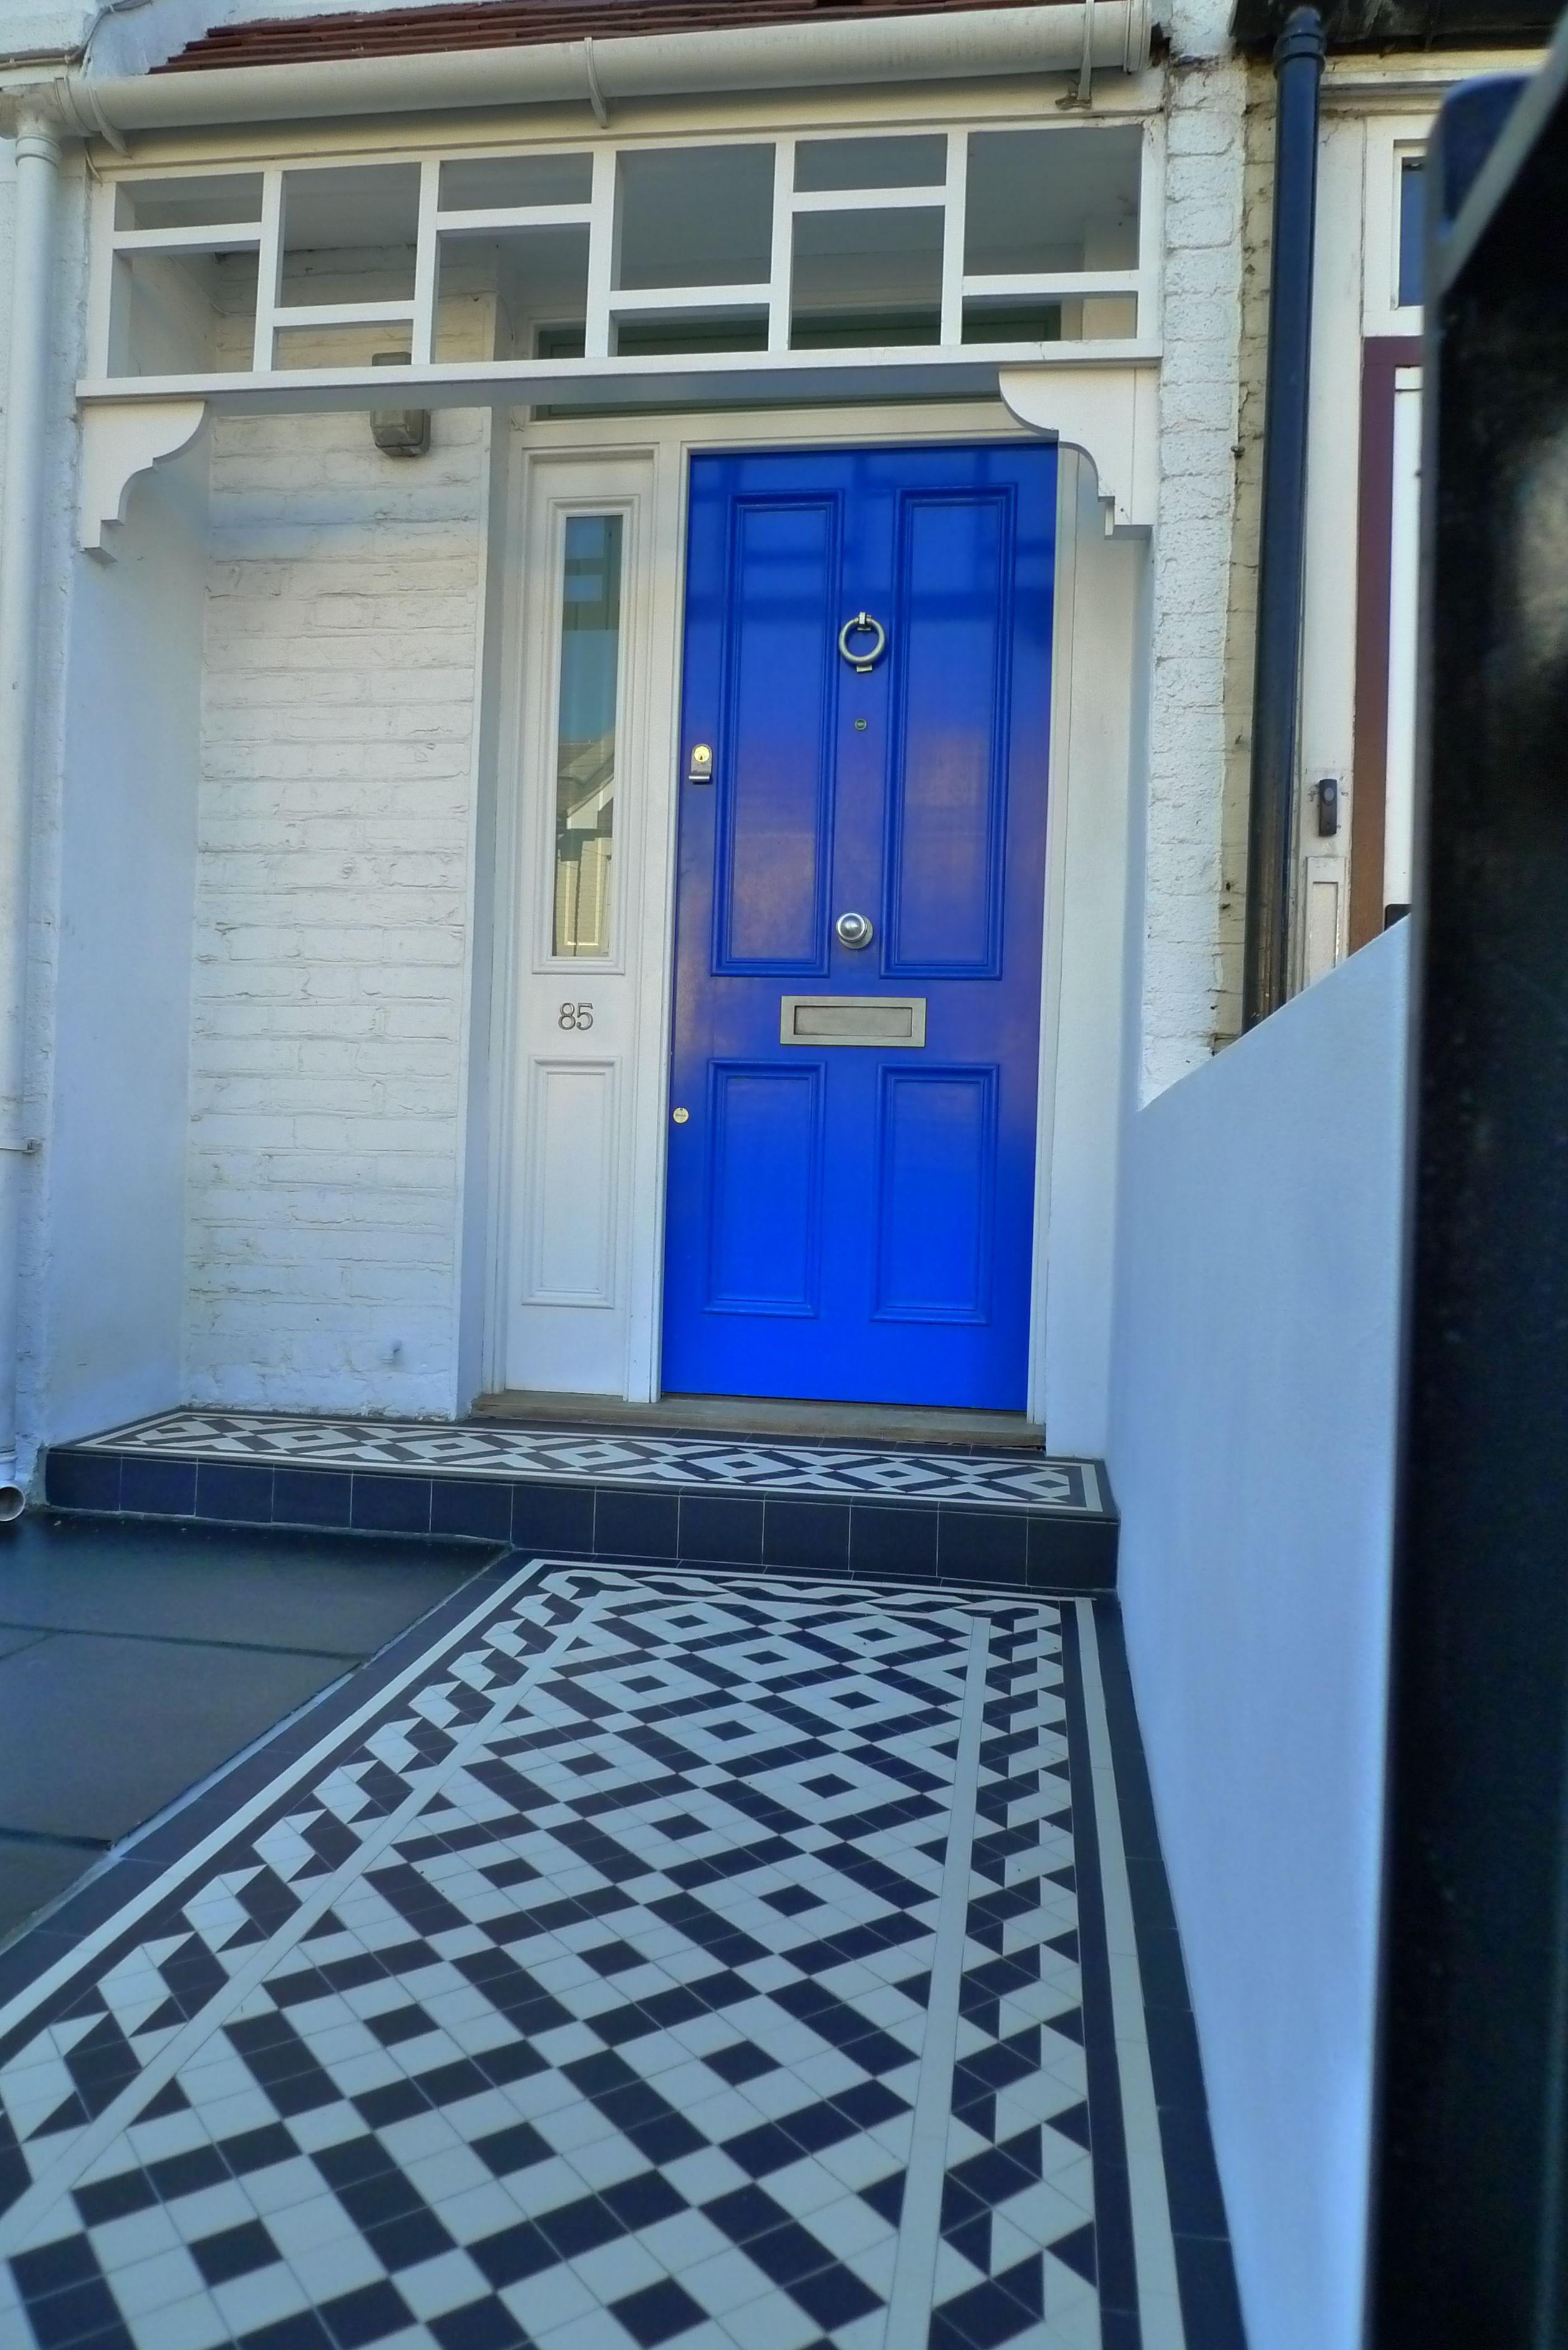 Teal hallway ideas  Pin by Anewgarden Ltd on Victorian Mosaic Entrance Hallway  Pinterest